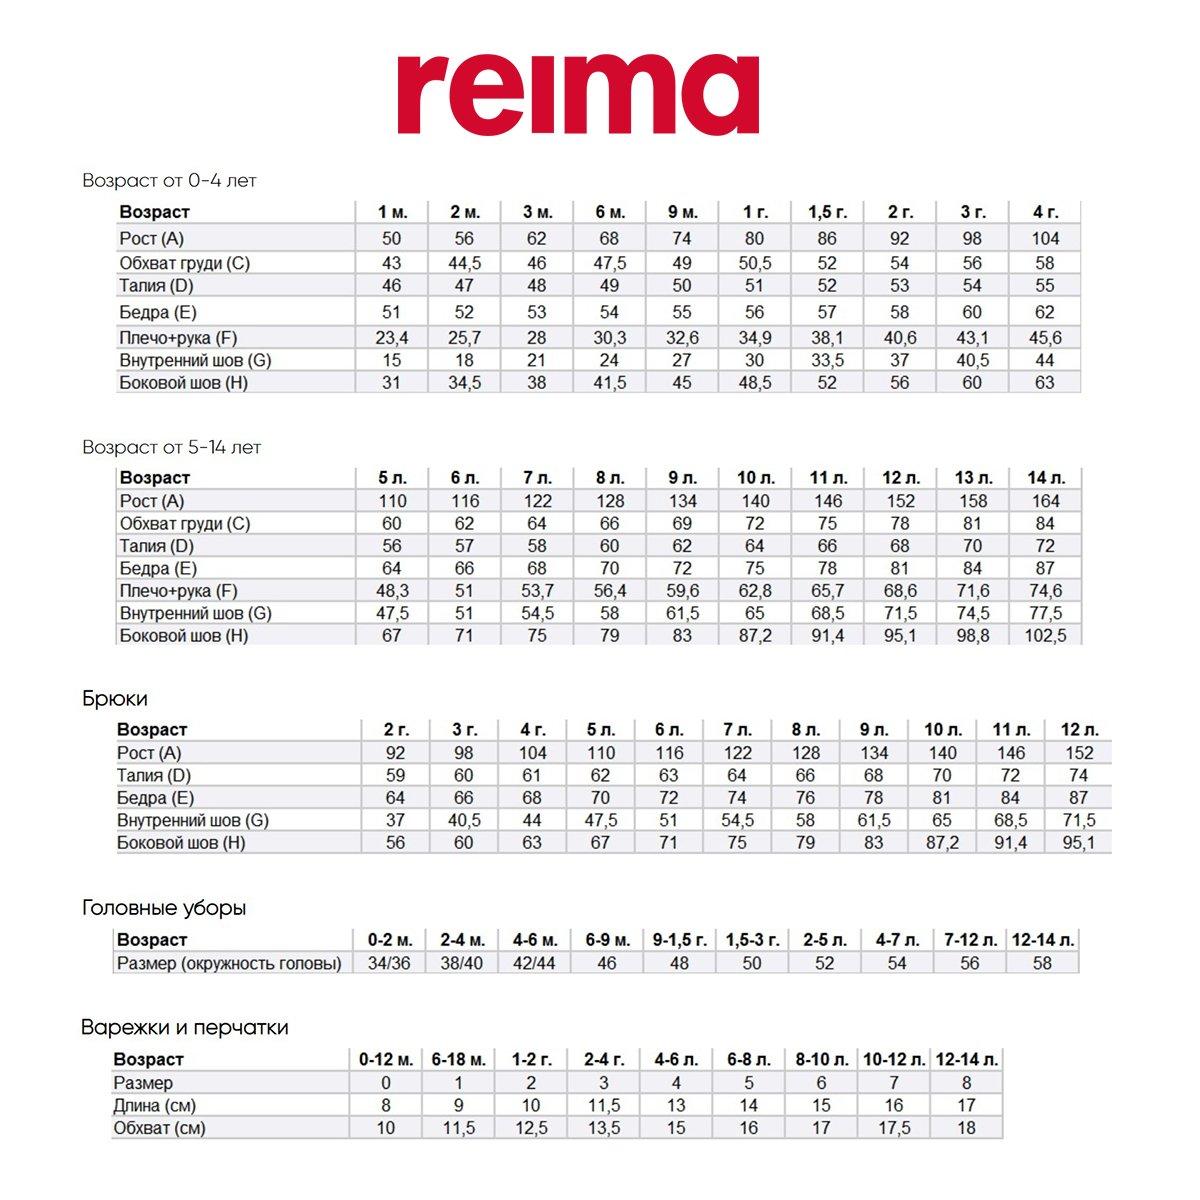 Купить Верхняя одежда, Куртка Lassie by Reima Blue, р. 110 721758R-6961 ТМ: LASSIE by reima, синий